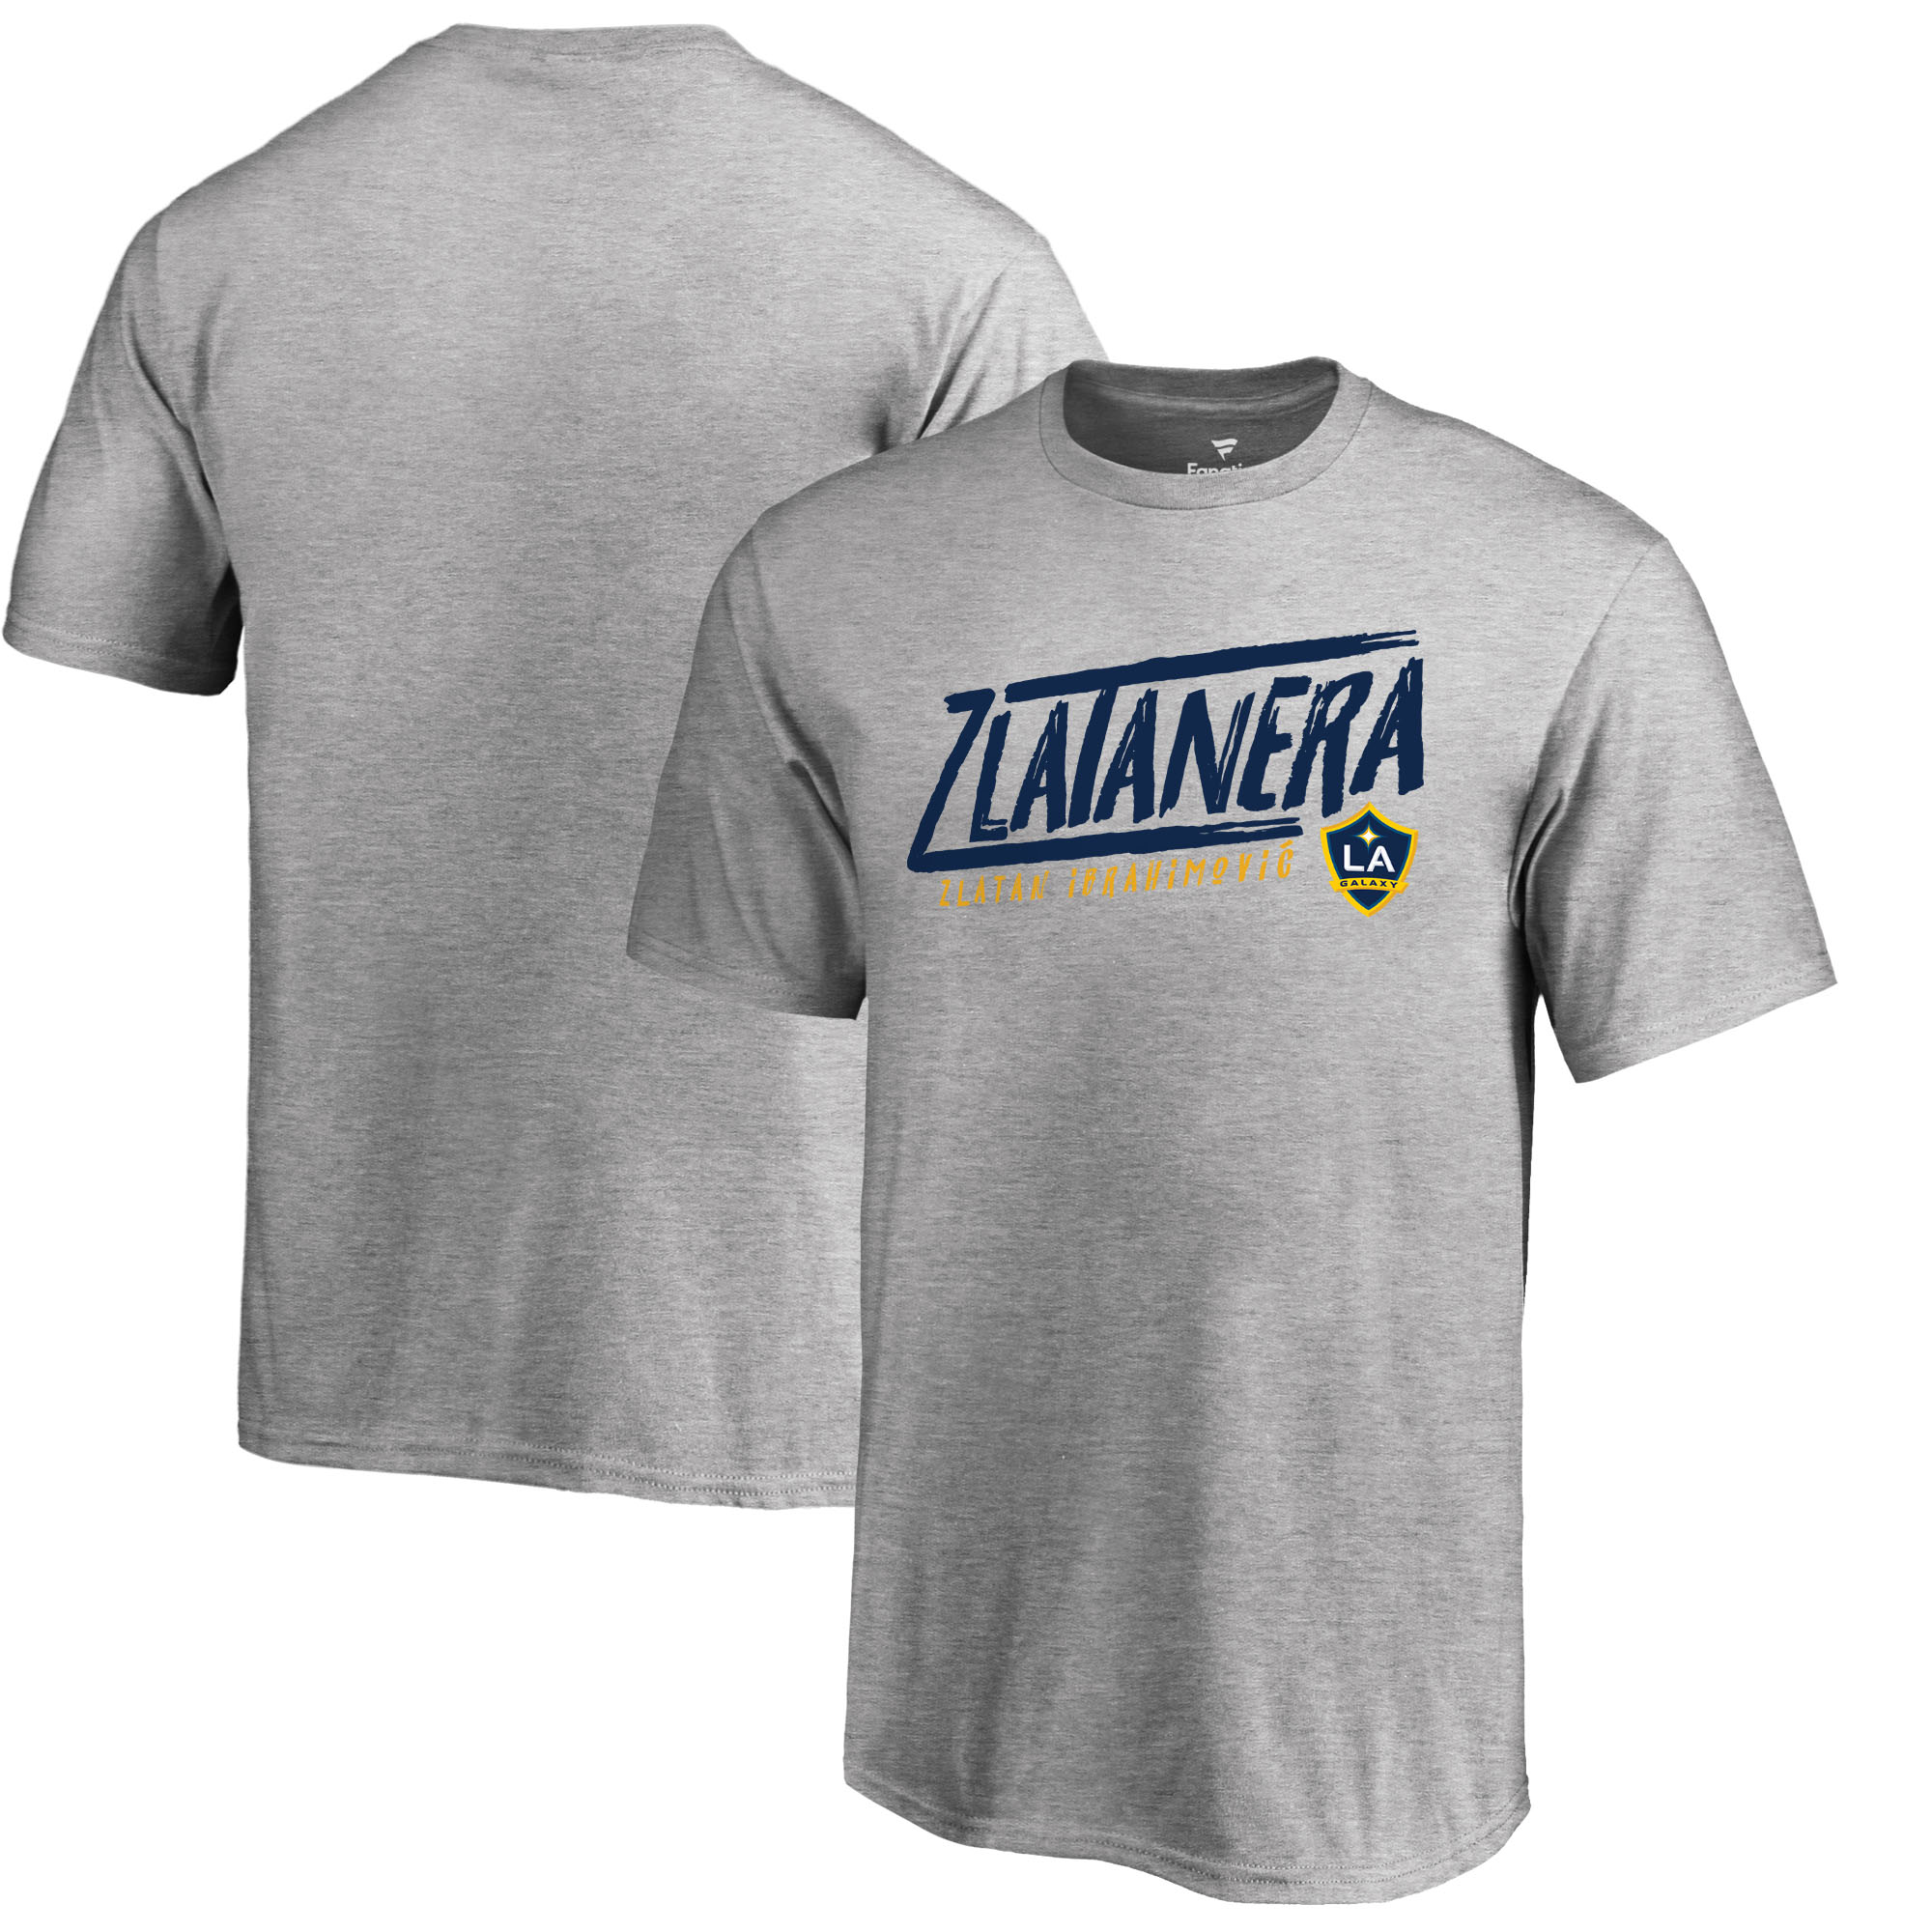 Zlatan Ibrahimovic LA Galaxy Fanatics Branded Youth Hometown Collection Zlatanera T-Shirt - Heather Gray